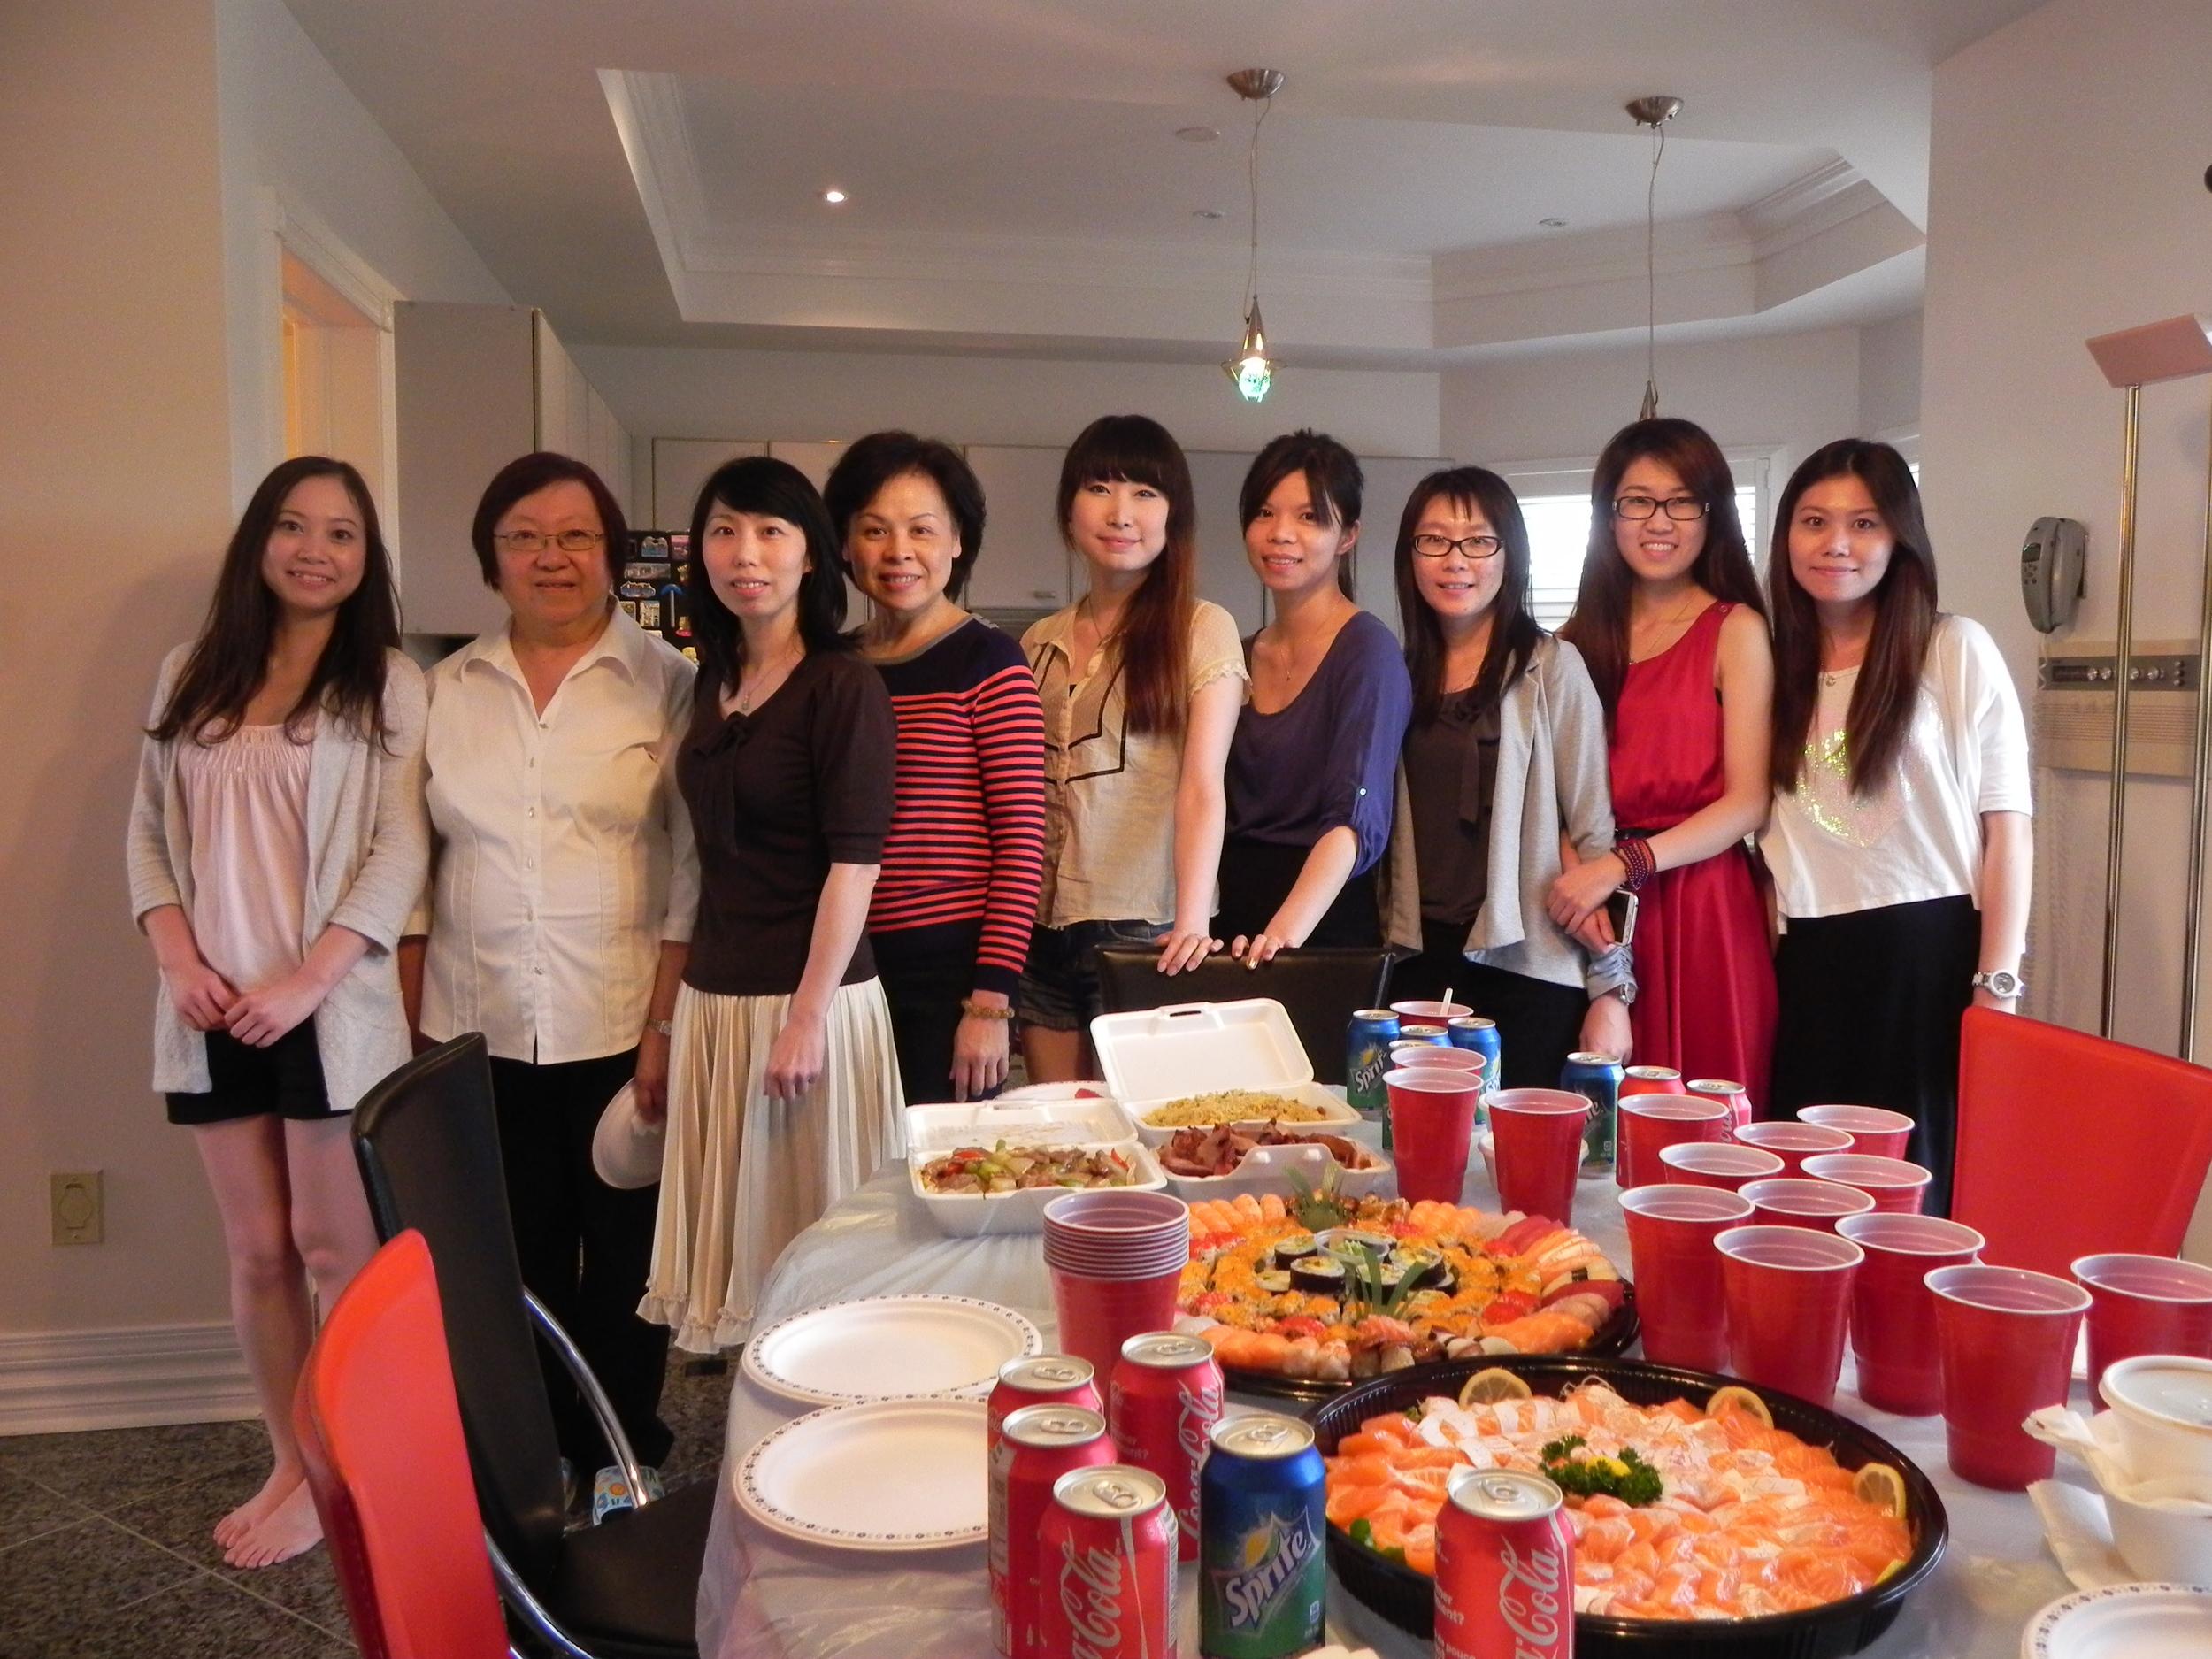 The Ladies of OIBC